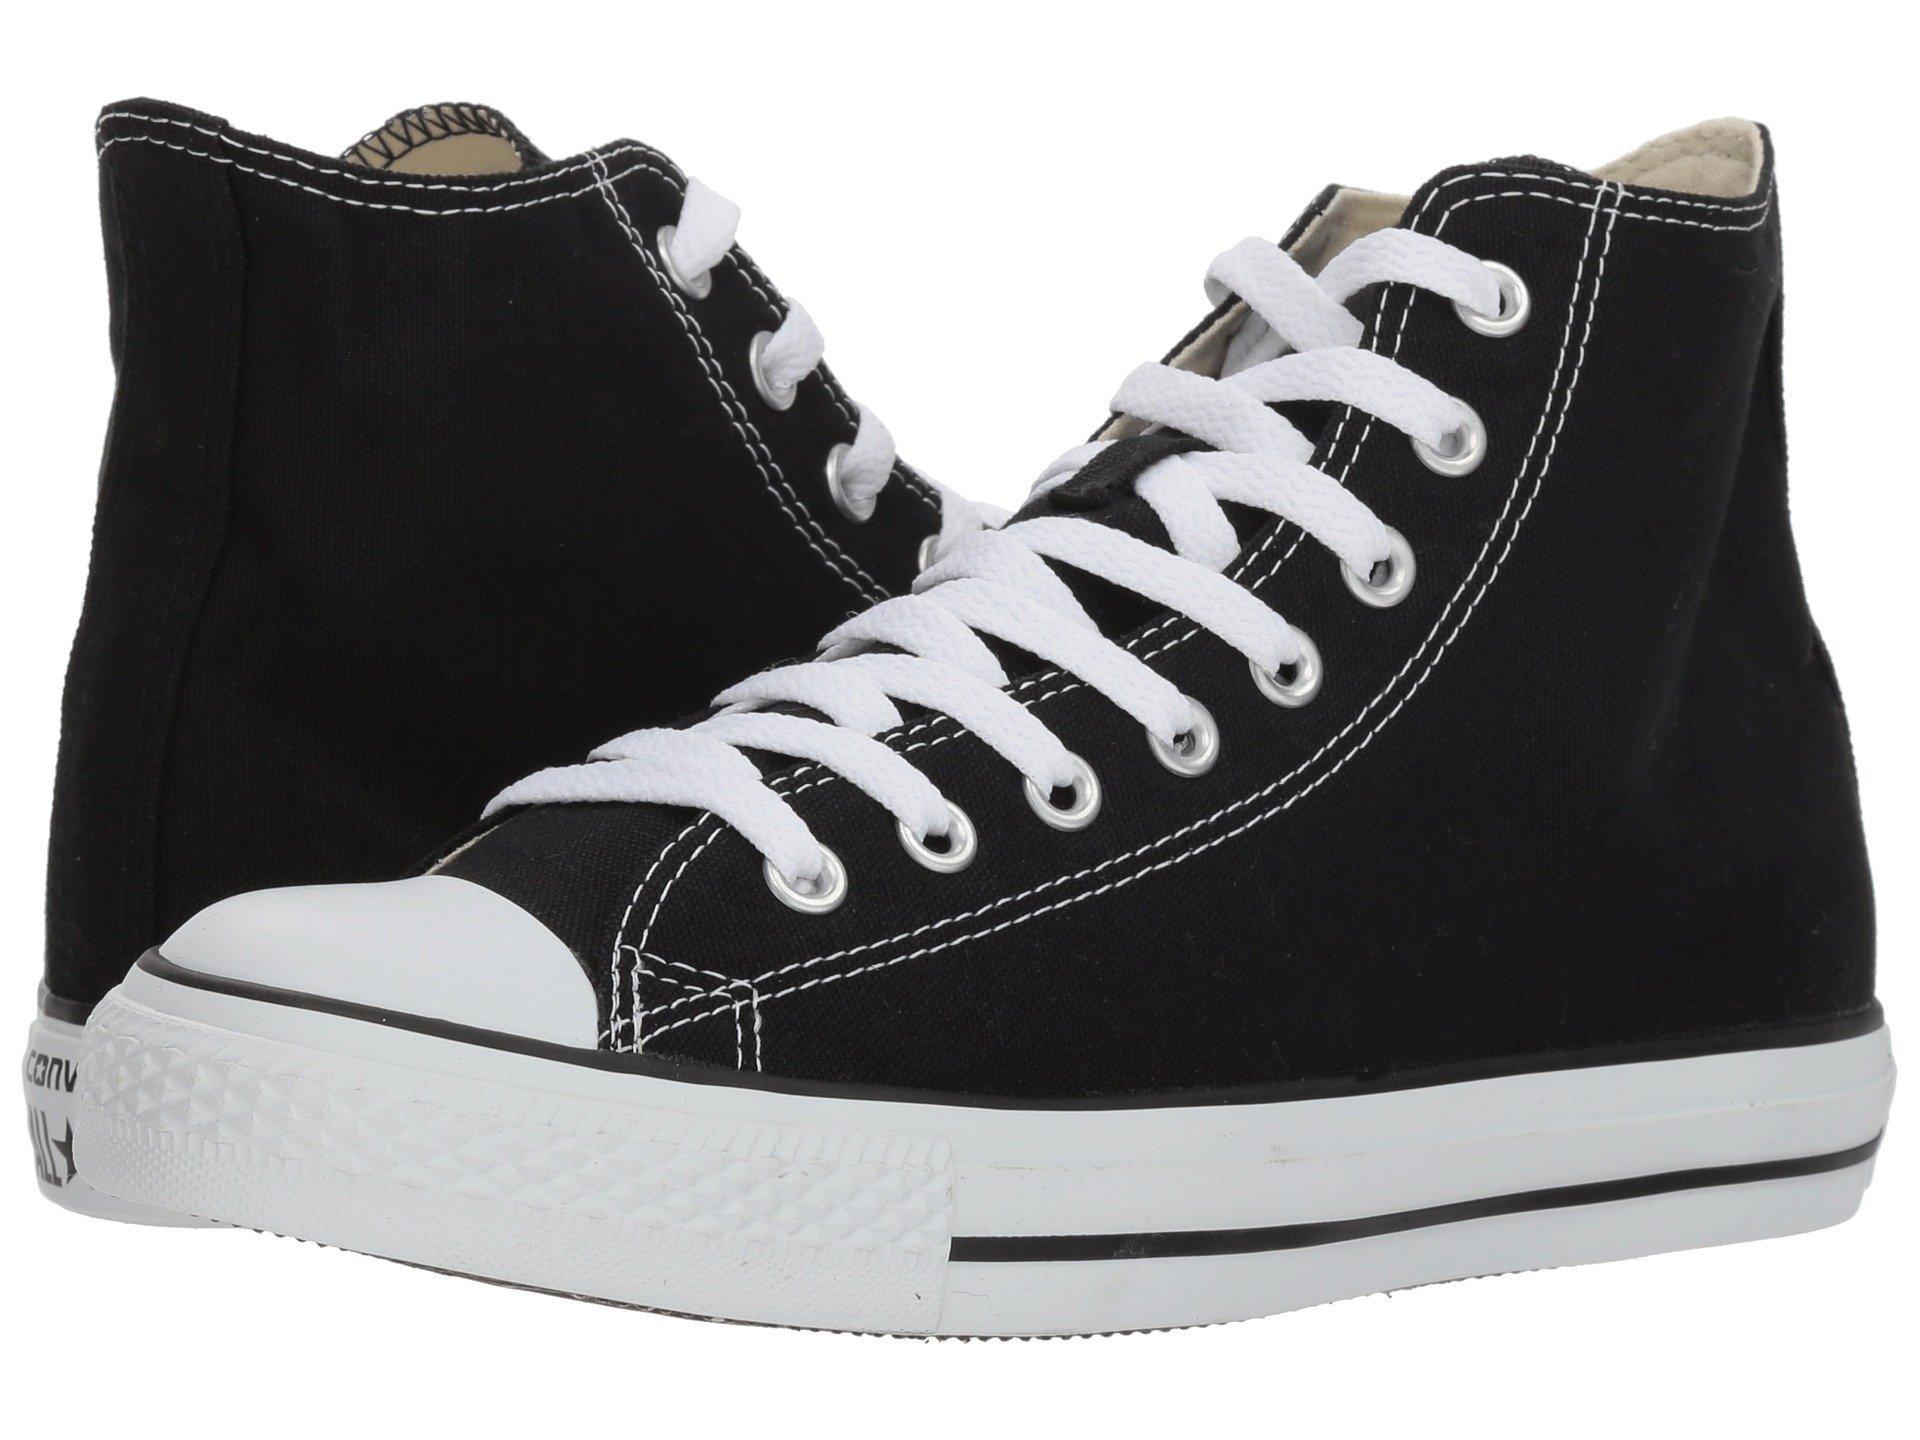 converse high tops black amazon